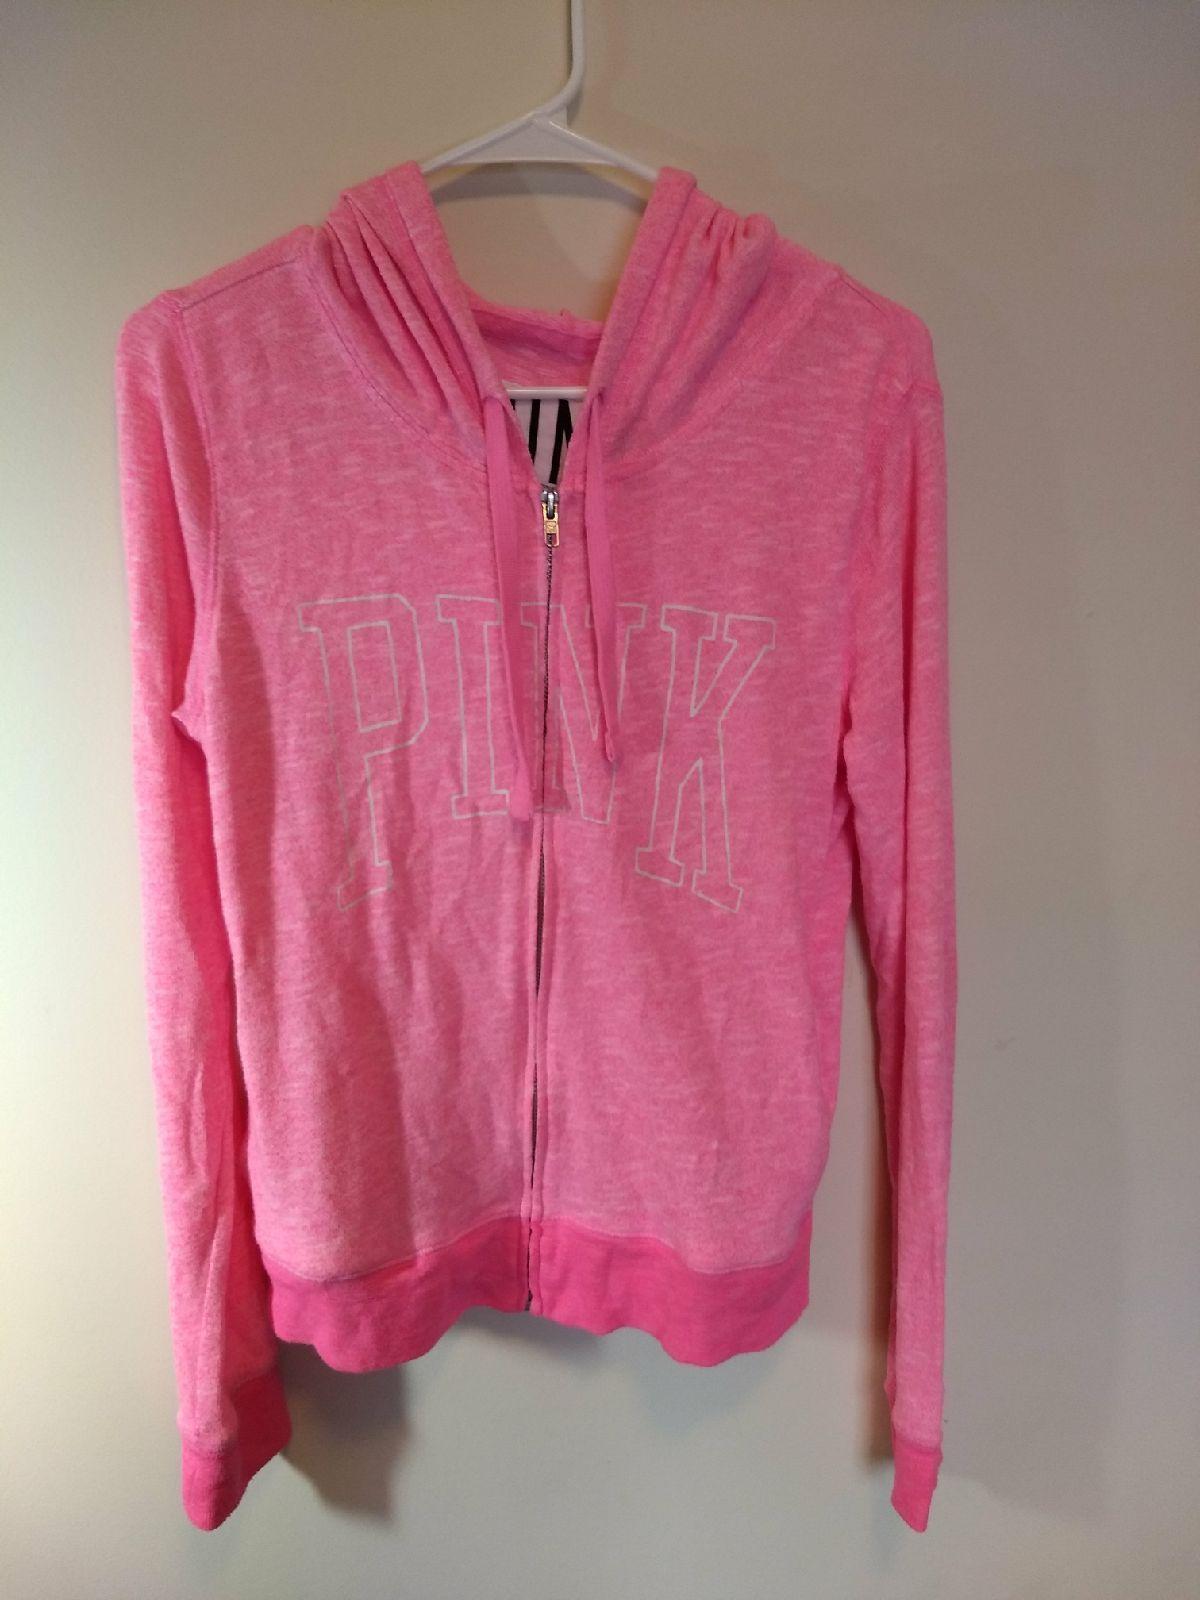 Pink Victoria's Secret fleece jacket - Mercari: BUY & SELL THINGS ...